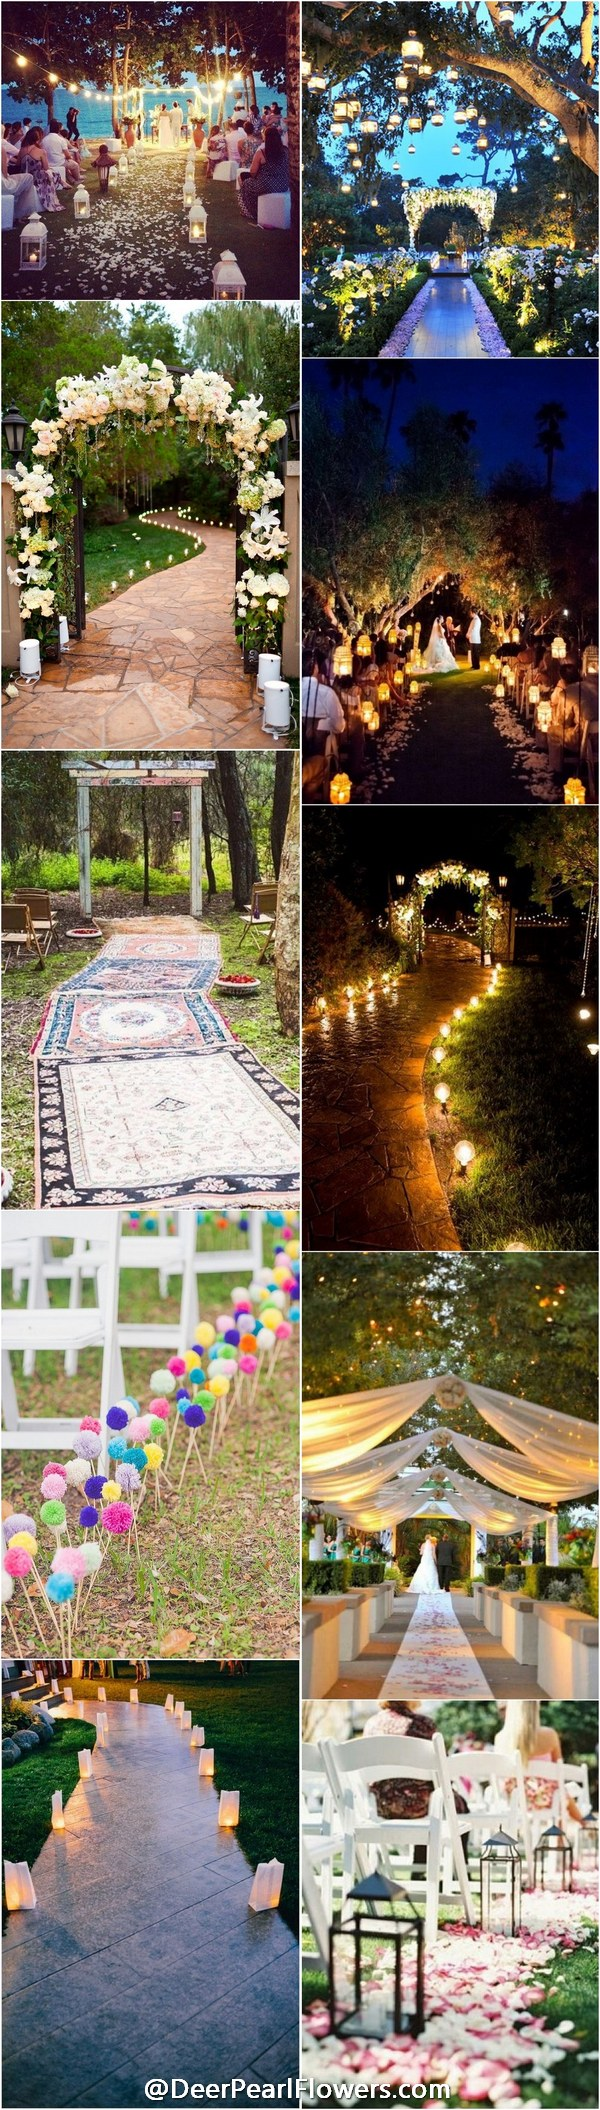 Wedding entry decoration ideas   Creative Wedding Entrance Walkway Decor Ideas  Pinterest